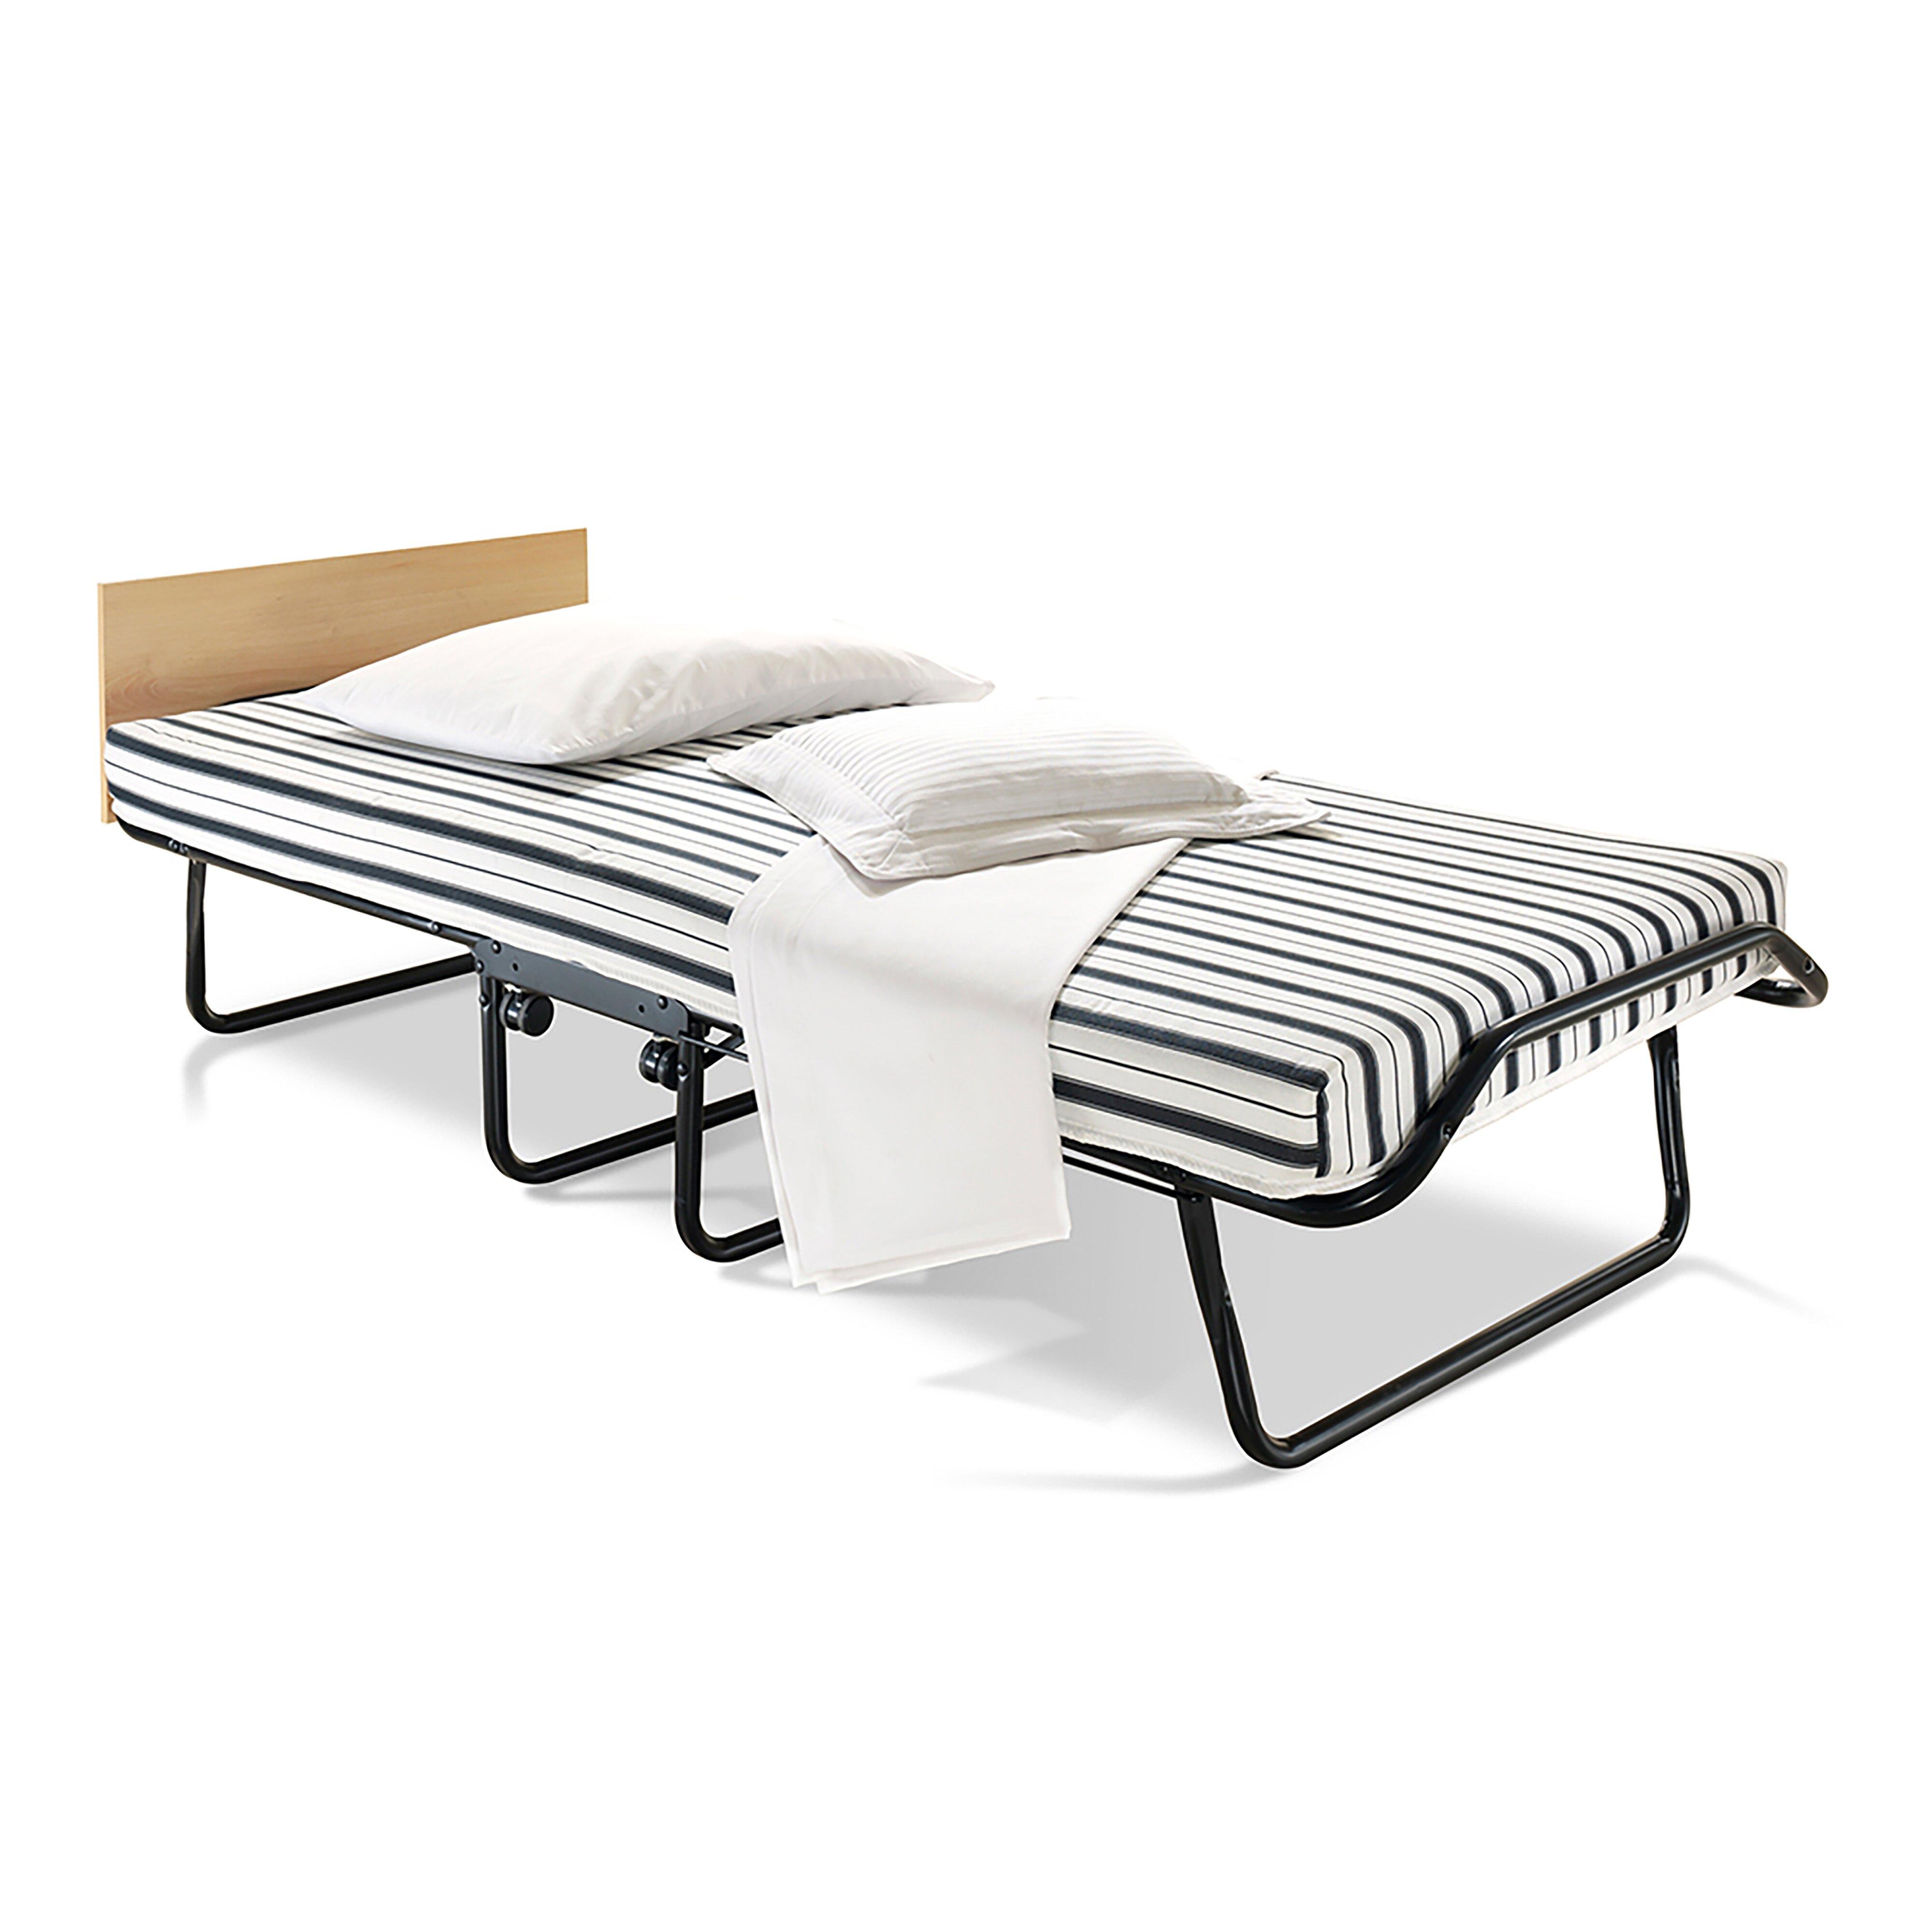 Folding Beds Reviews : Jay be jubilee folding bed reviews wayfair uk